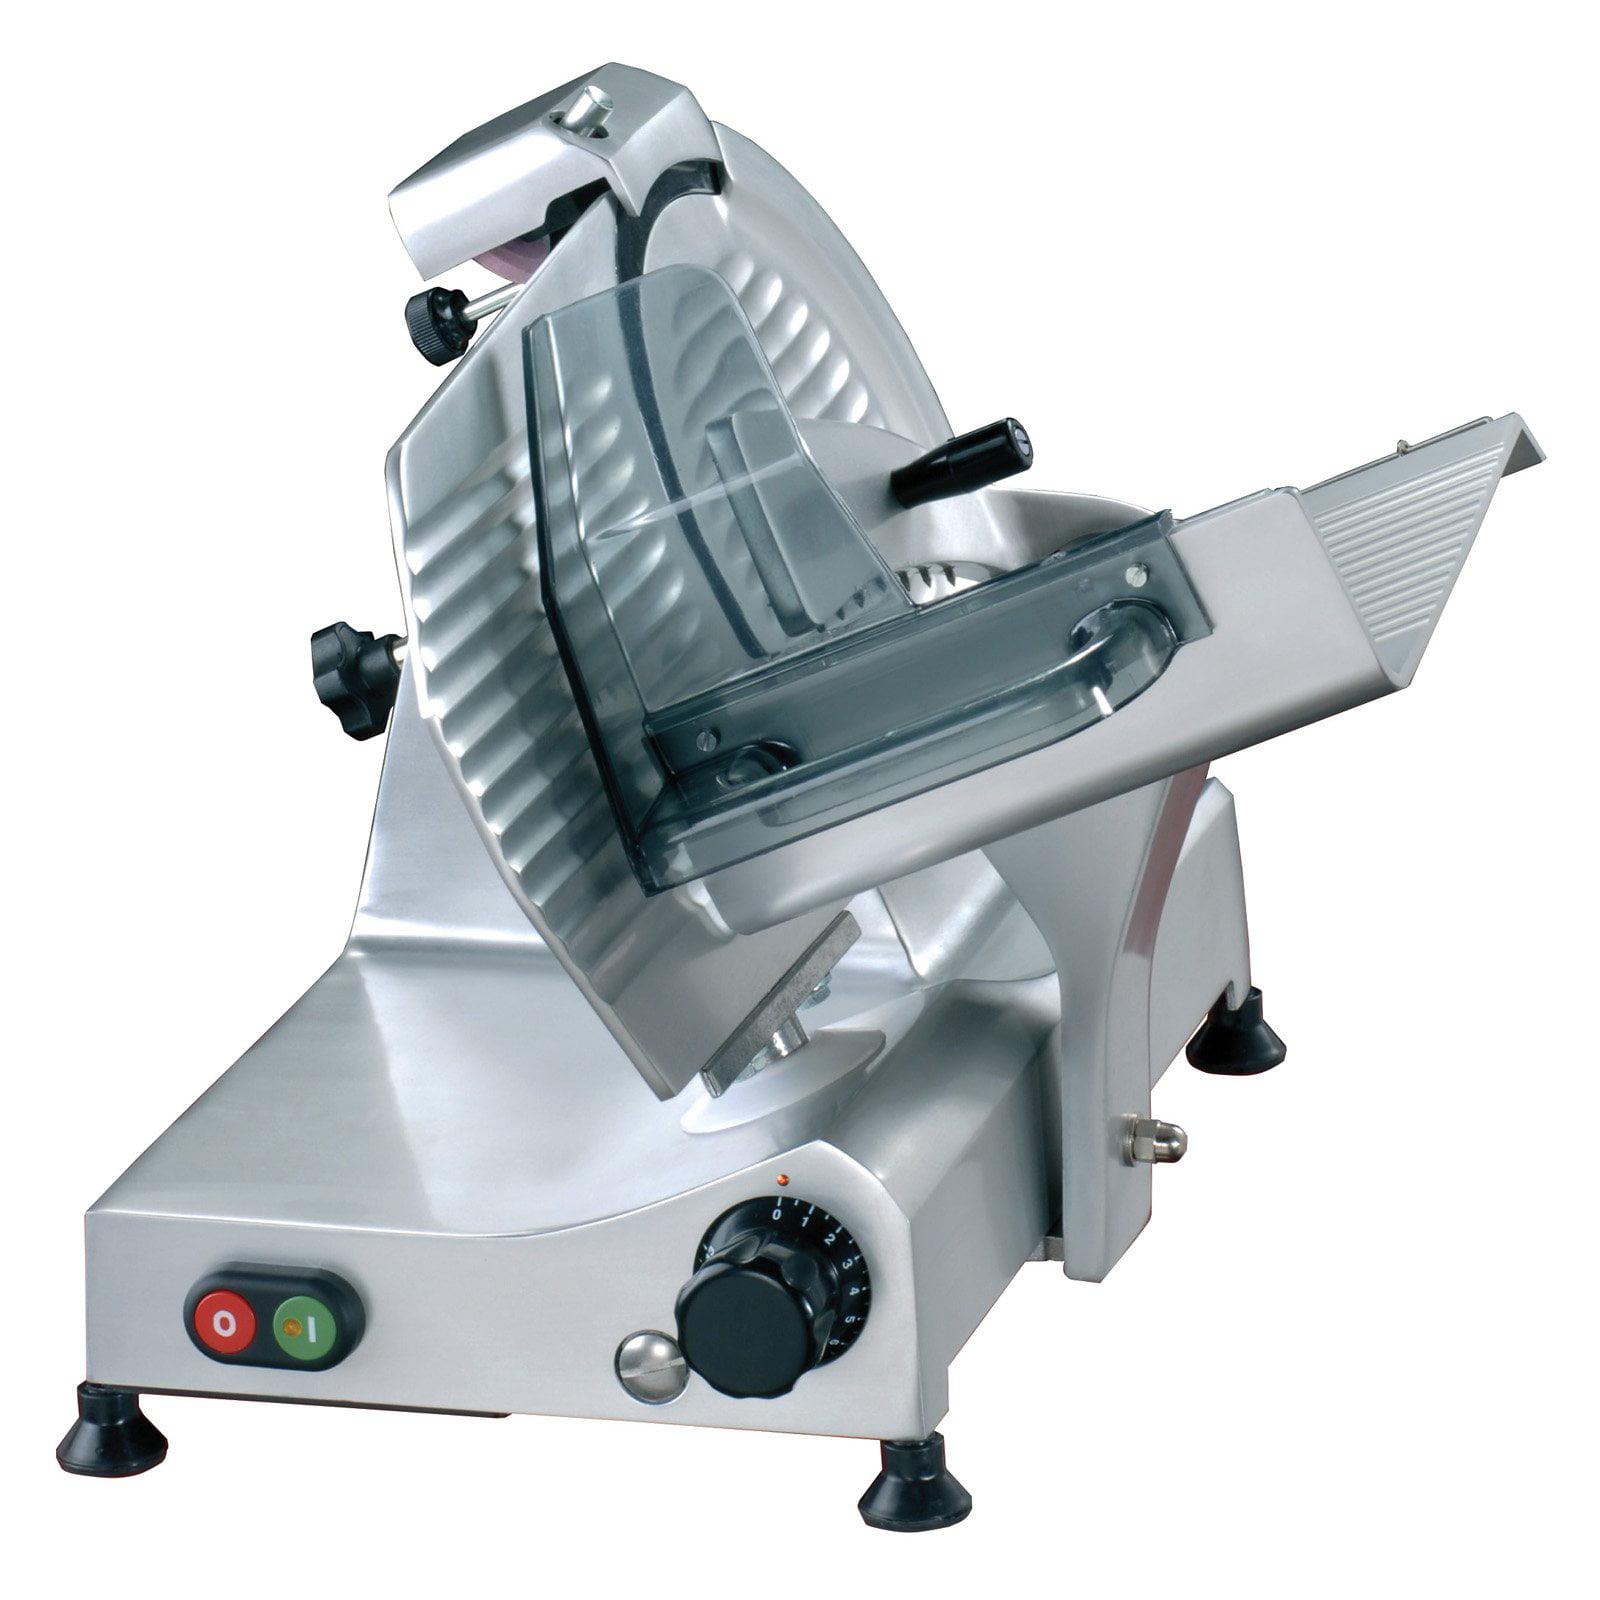 Omcan 250R 10 in. Commercial Food Slicer